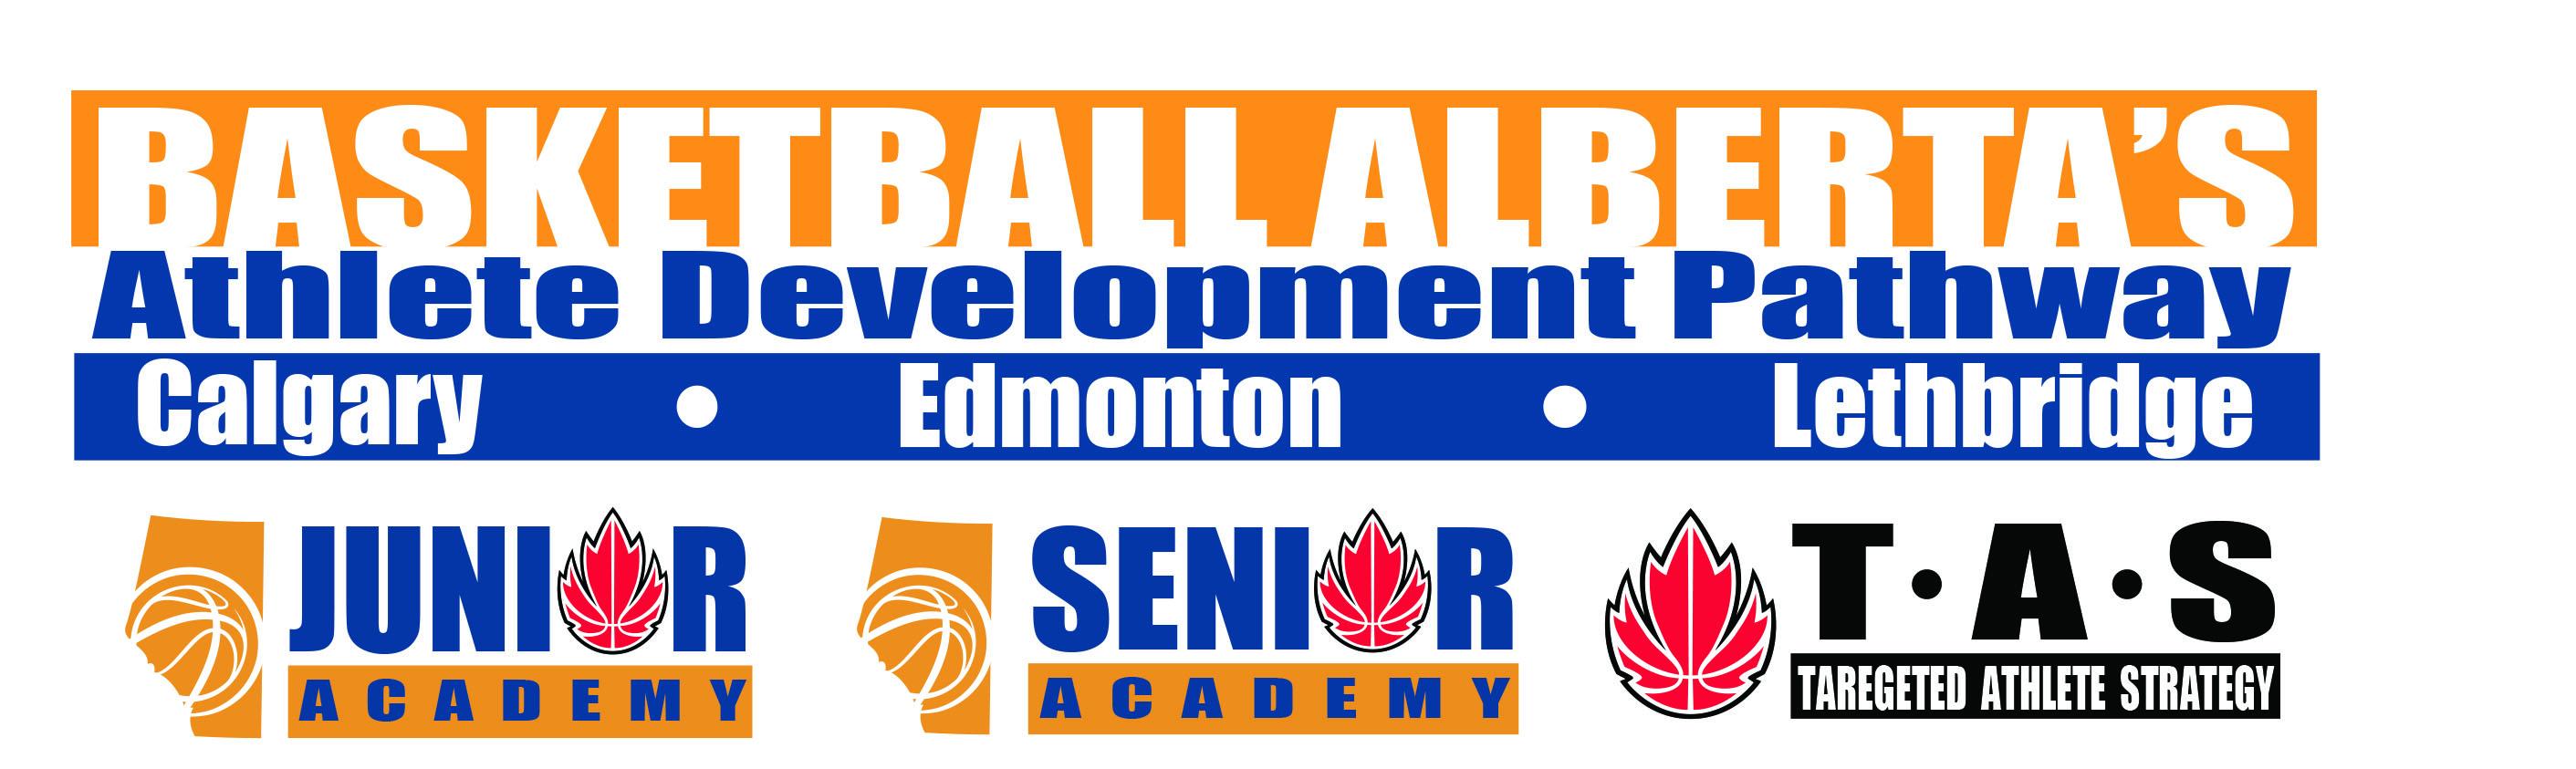 Alberta Basketball Association Website By Ramp Interactive